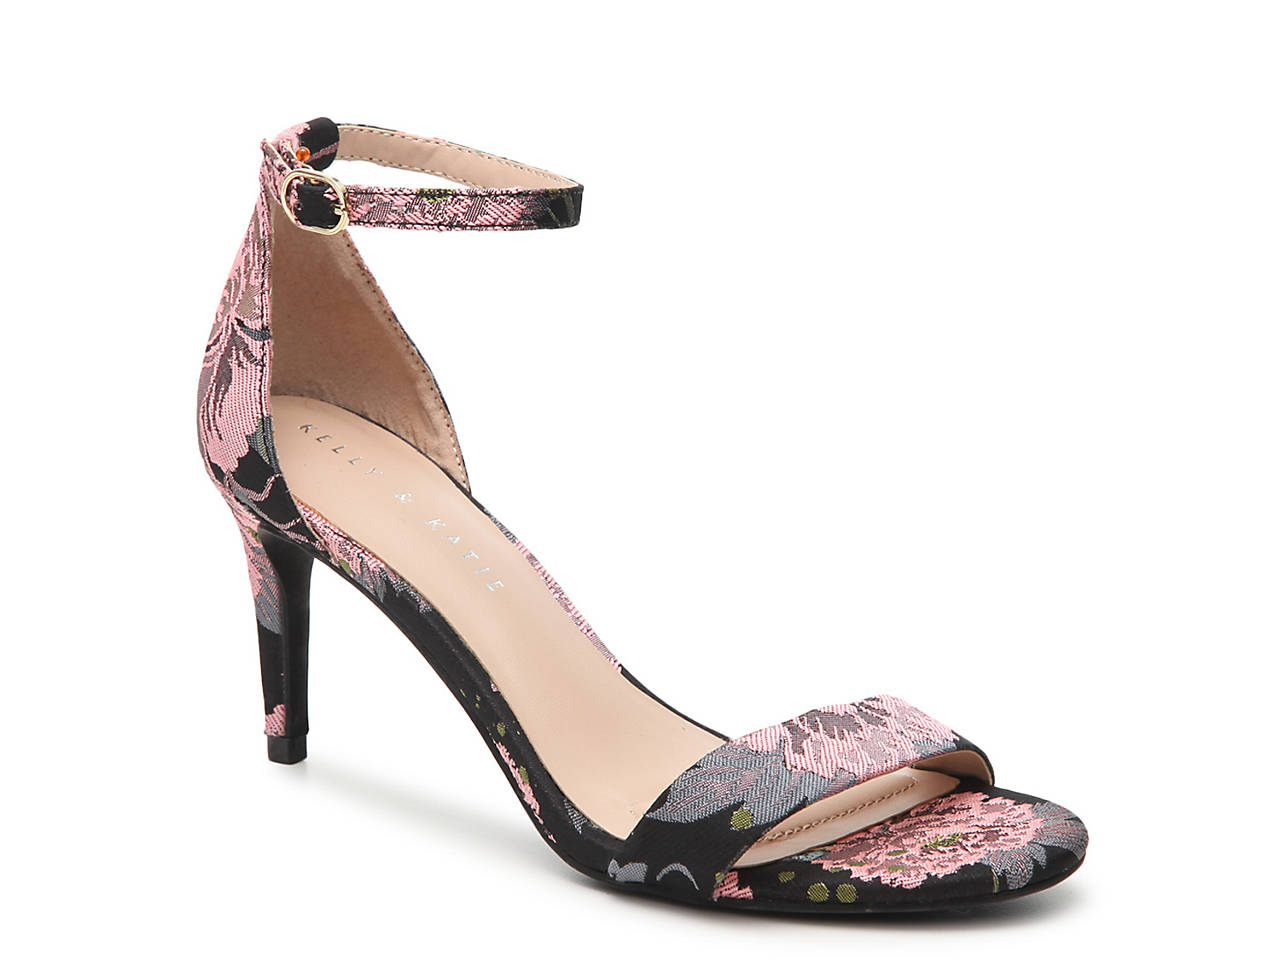 Kelly Katie Womens kristie Open Toe Black Ankle Wrap Classic Pumps Black Toe Size 8.0 2a4d72